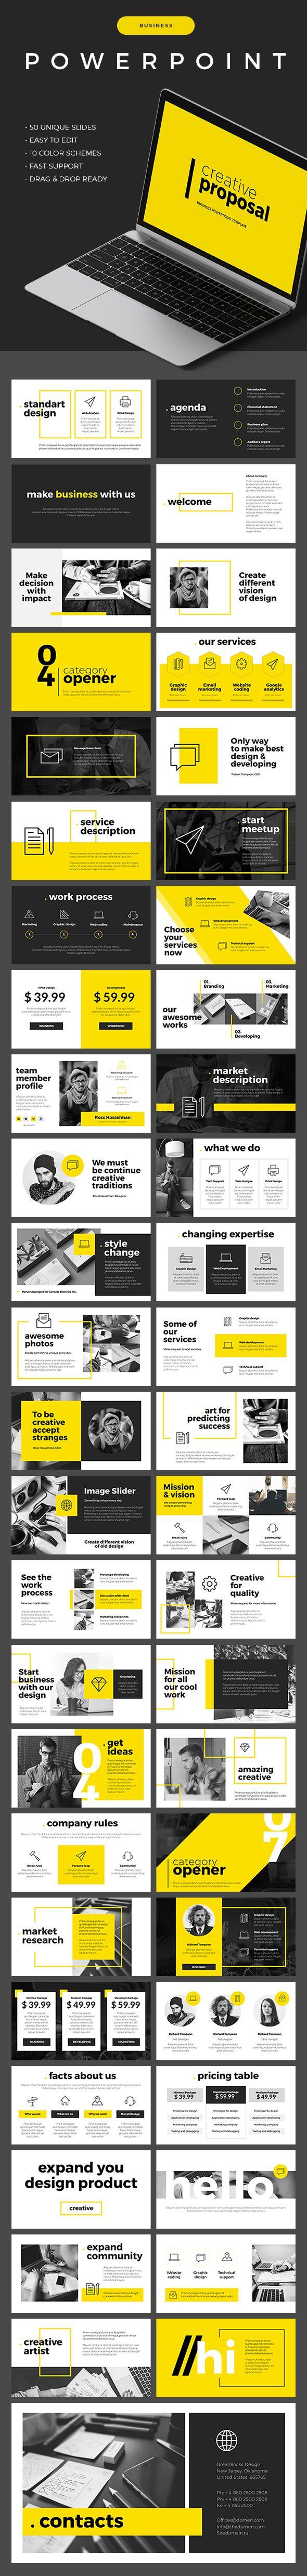 Business Powerpoint Template - 50 Unique Slides #powerpoint